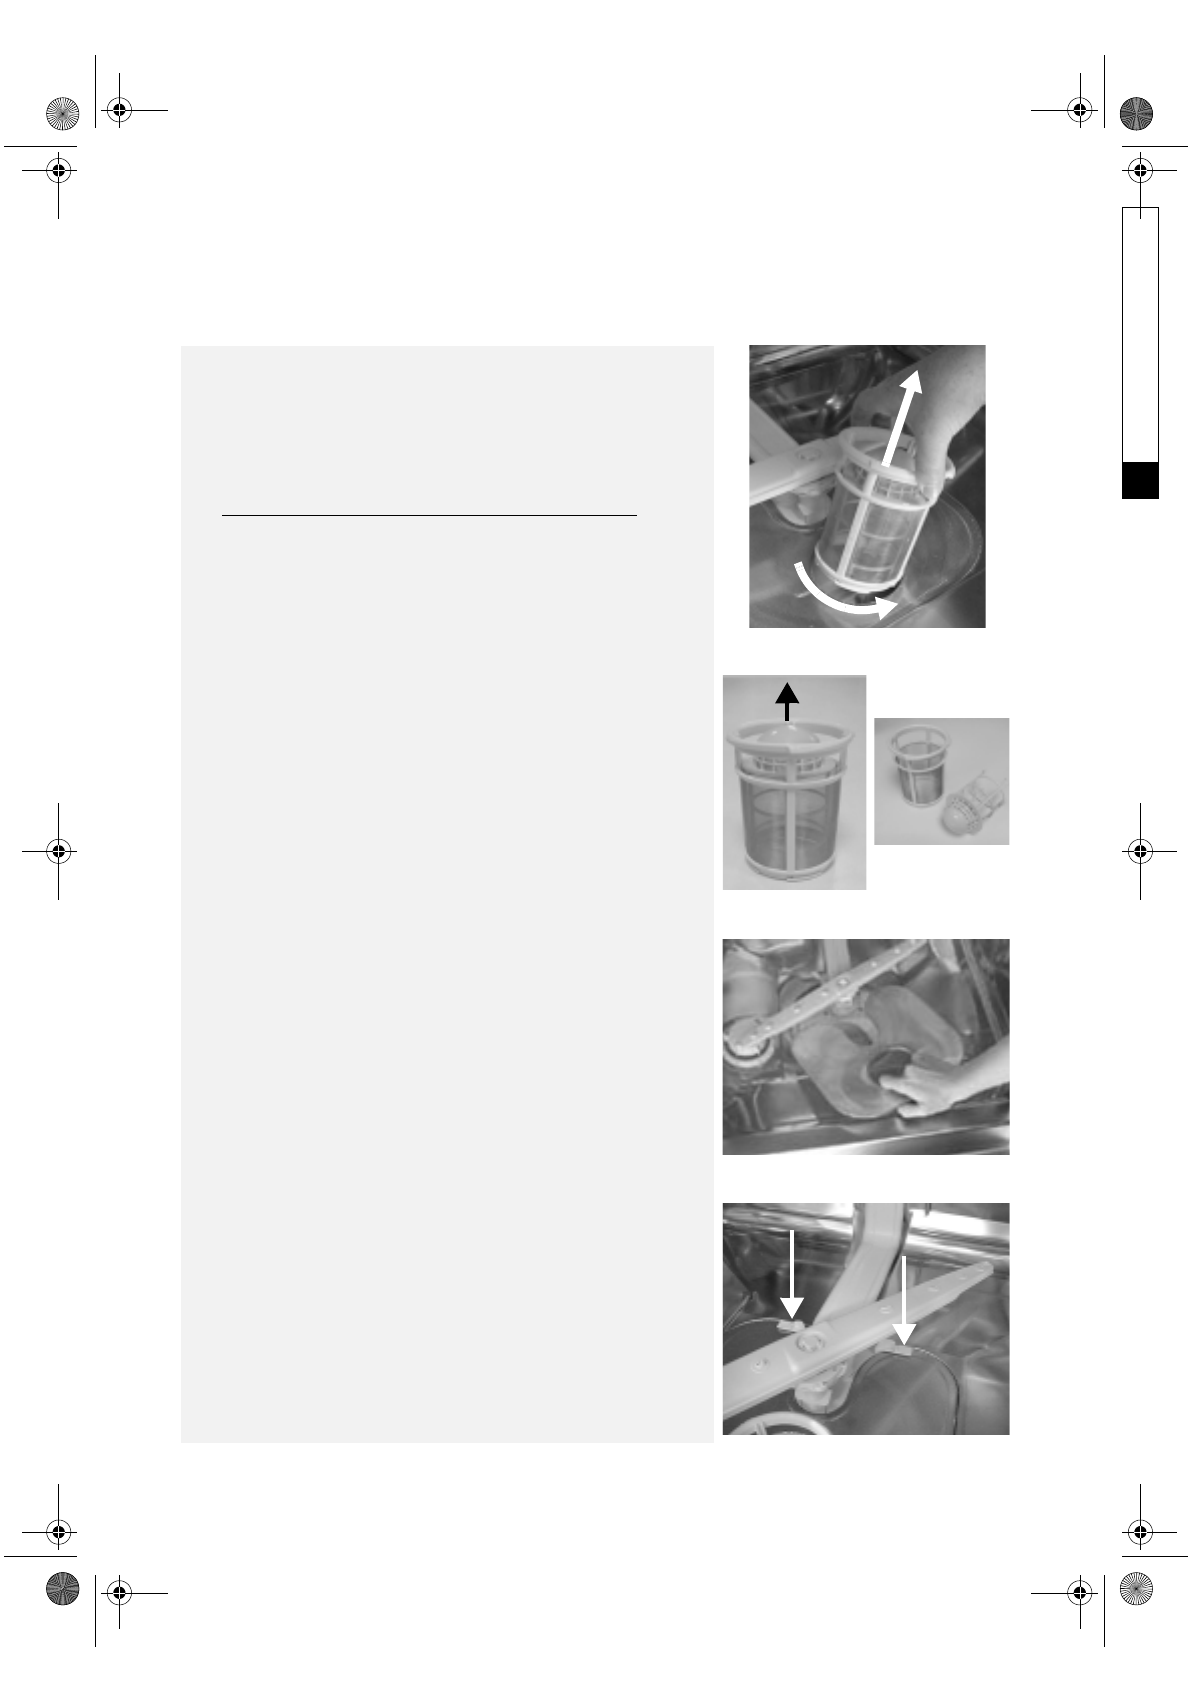 Home Water Filter >> Handleiding Whirlpool adg 9340 1 (pagina 8 van 8) (Nederlands)